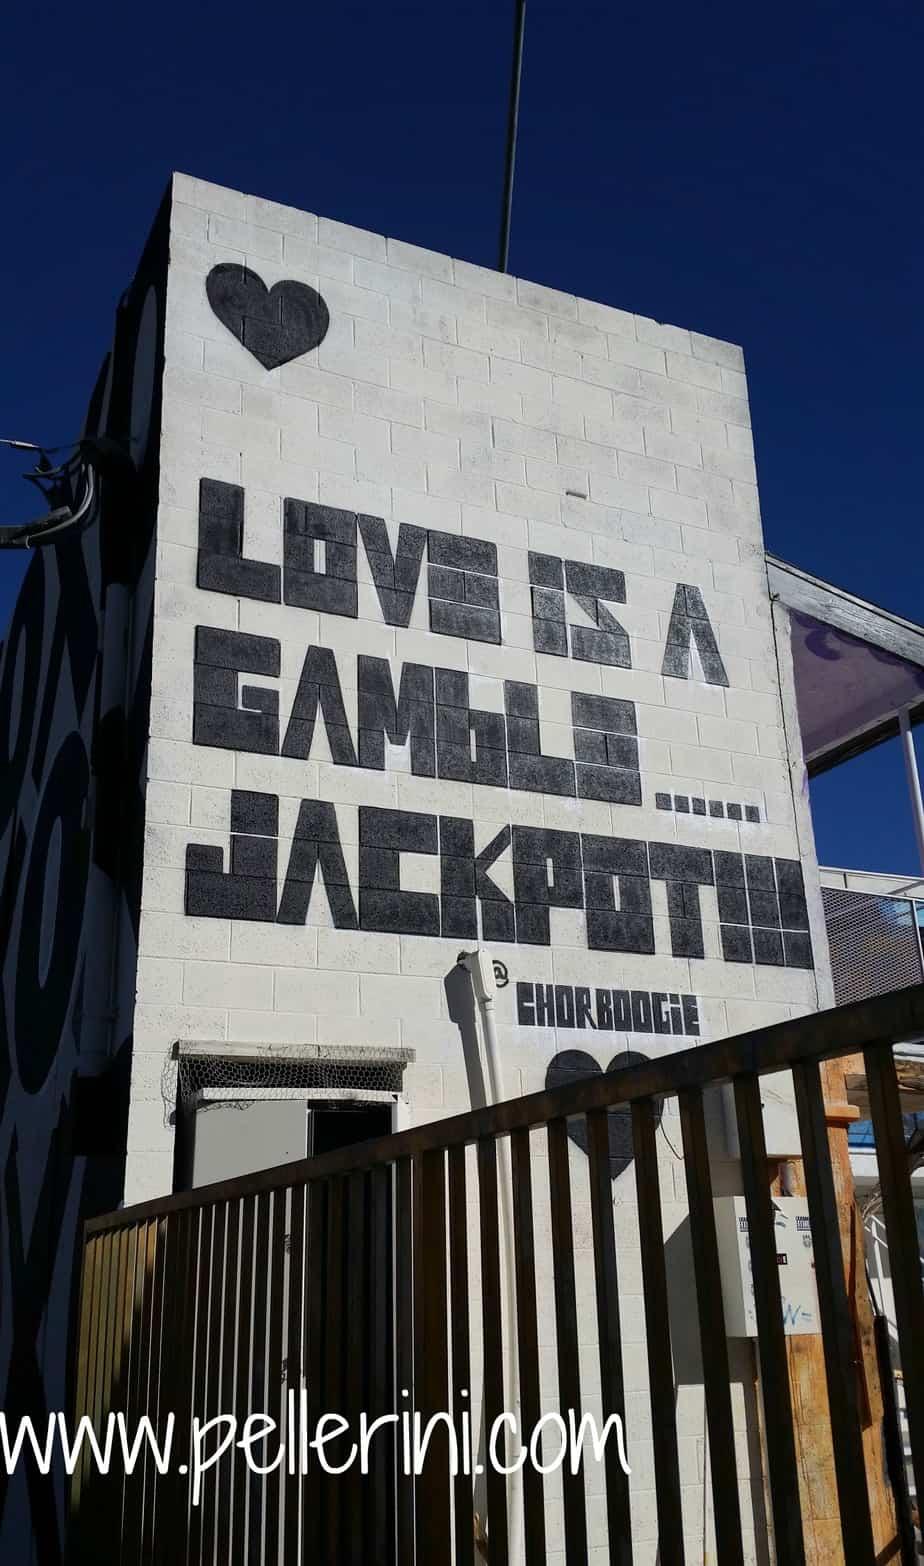 Chorboogie Street Art Downtown Las Vegas